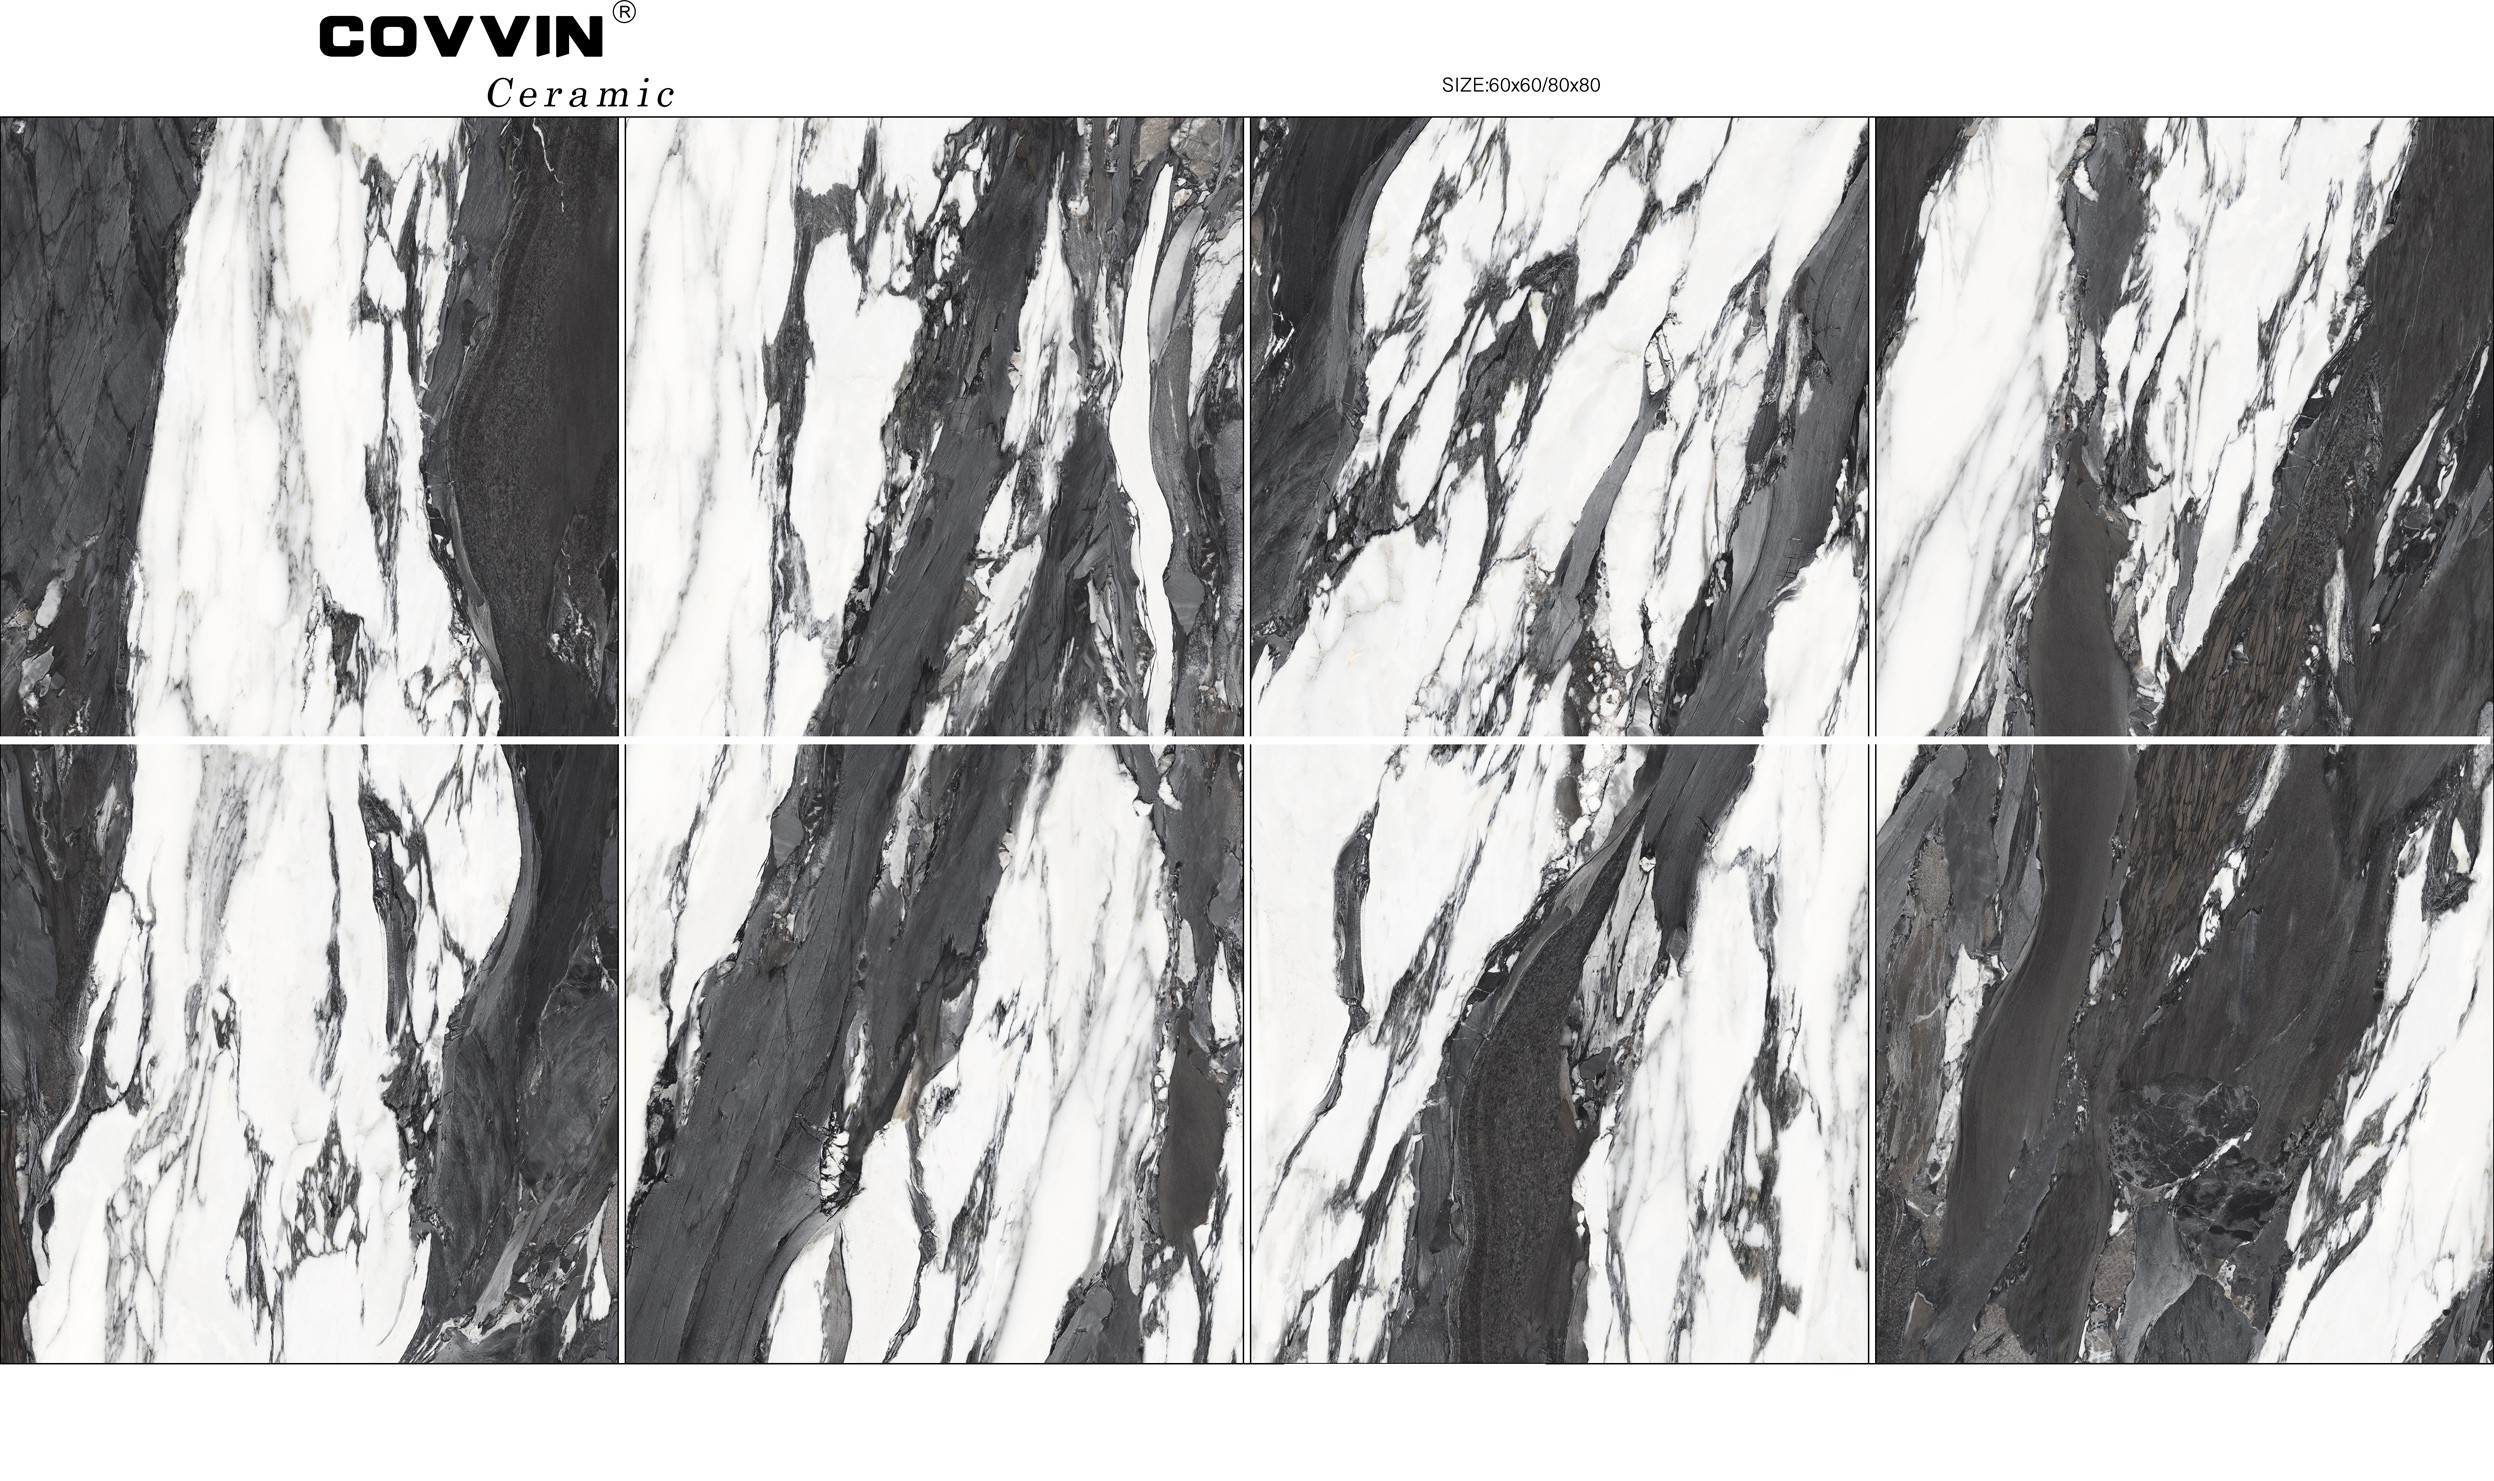 COVVIN-317.jpg